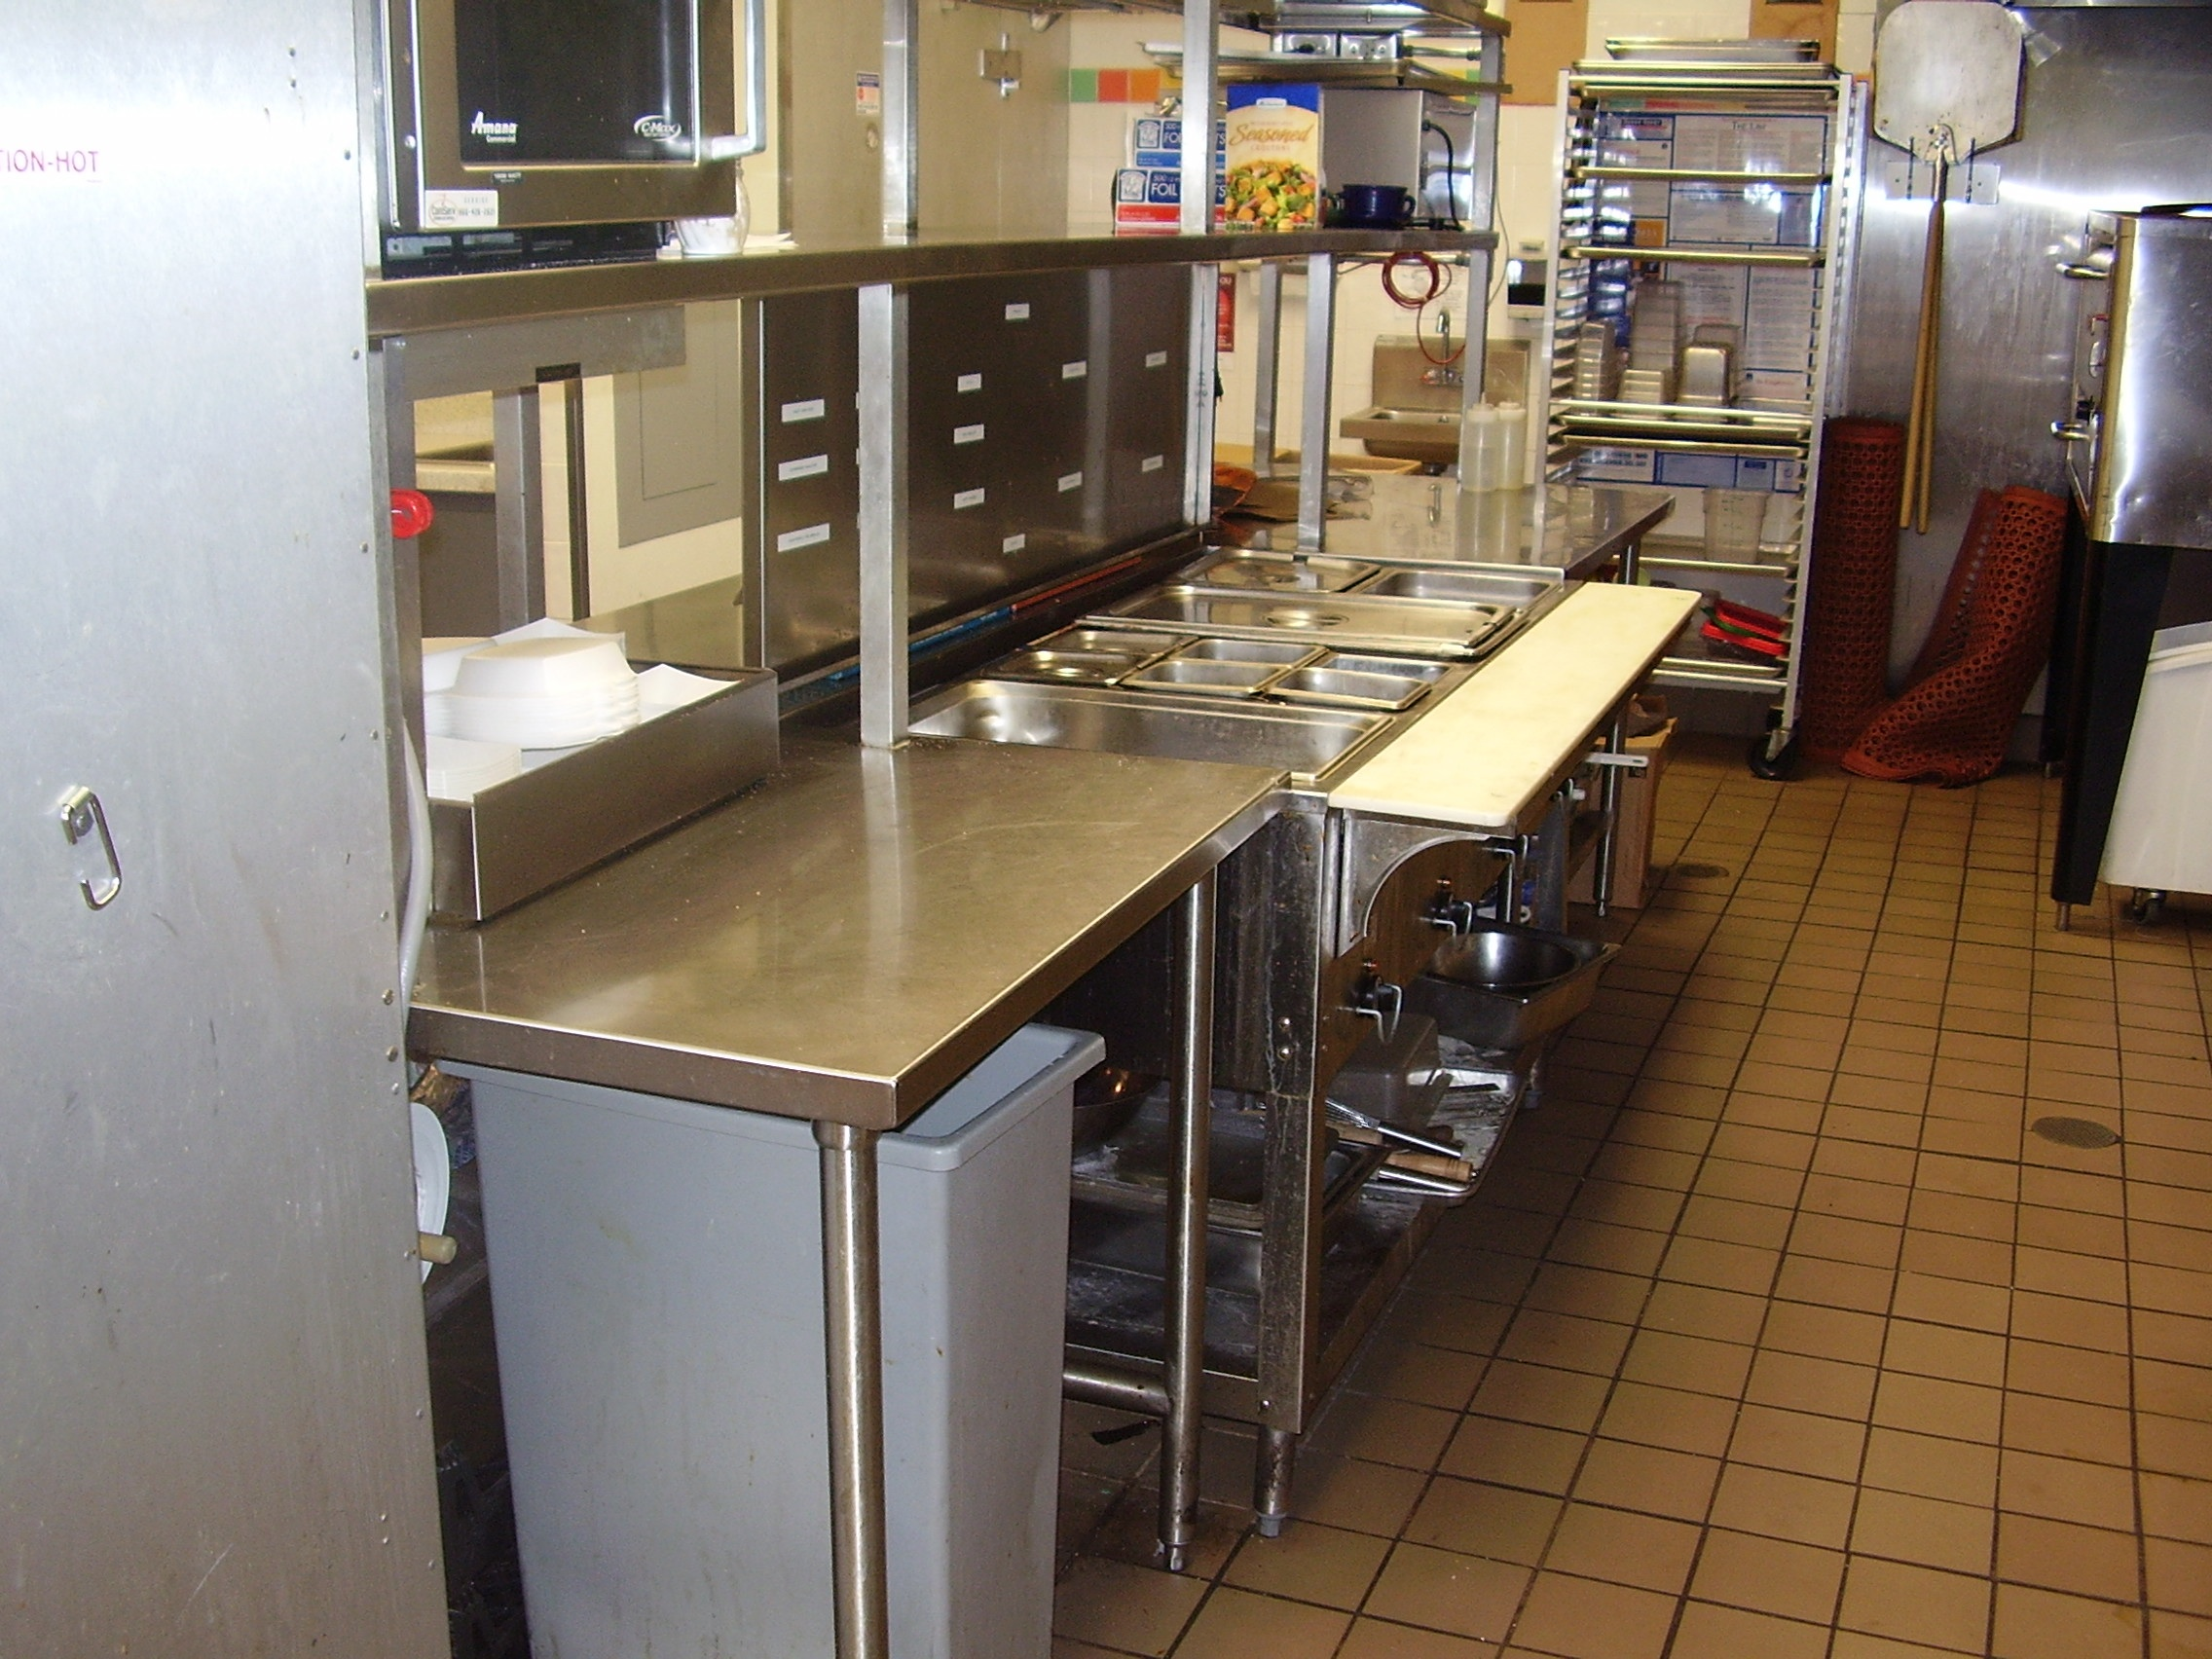 marvelous Restaurant Kitchen Equipment Prices #7: Restaurant Kitchen Equipment Prices